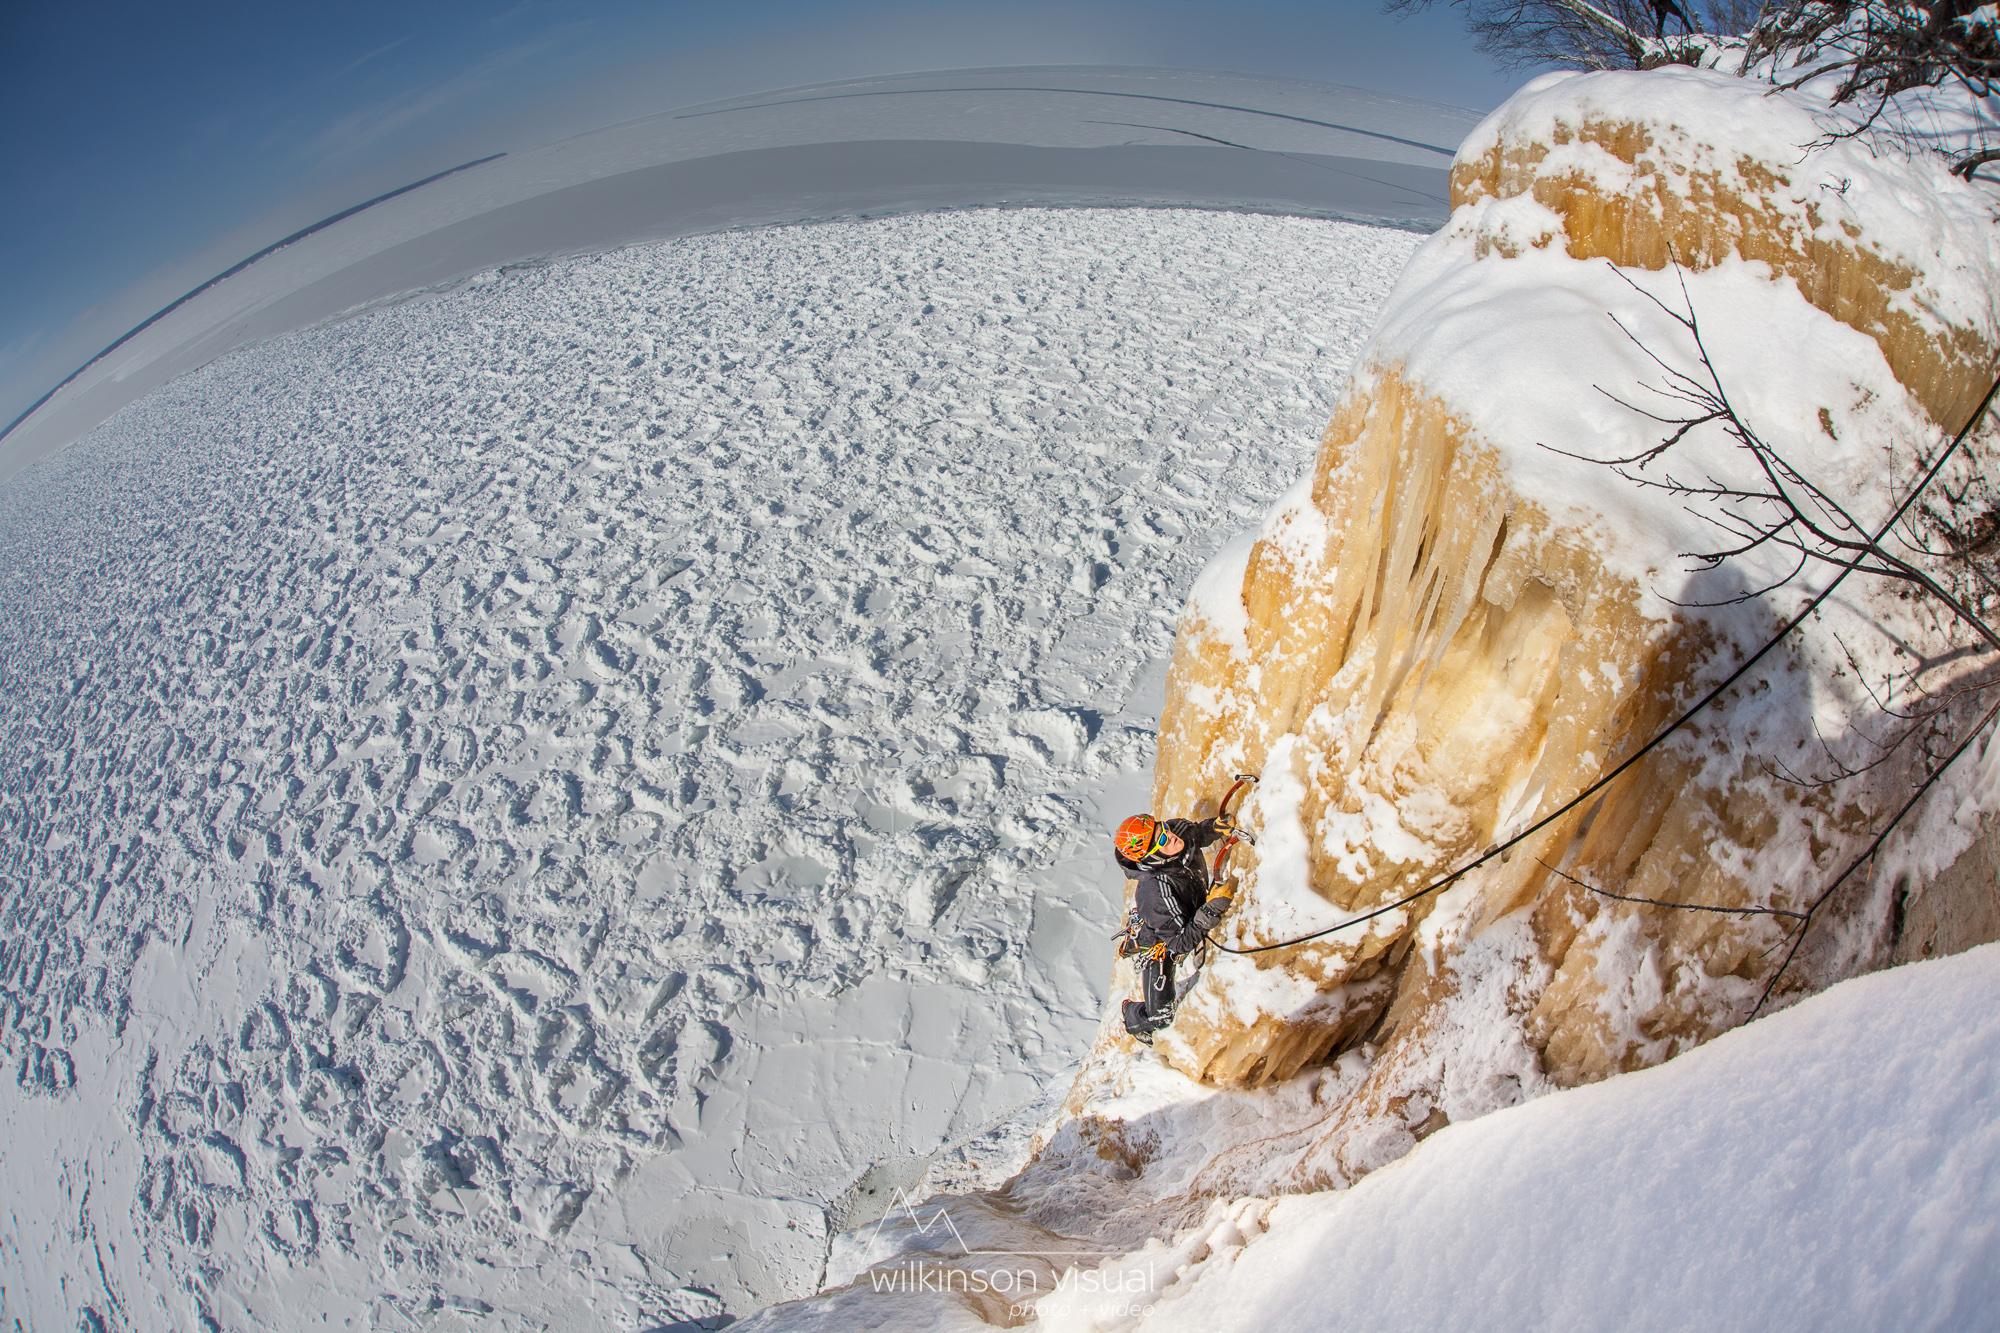 wilkinson-CAMP-mi-ice-1.jpg